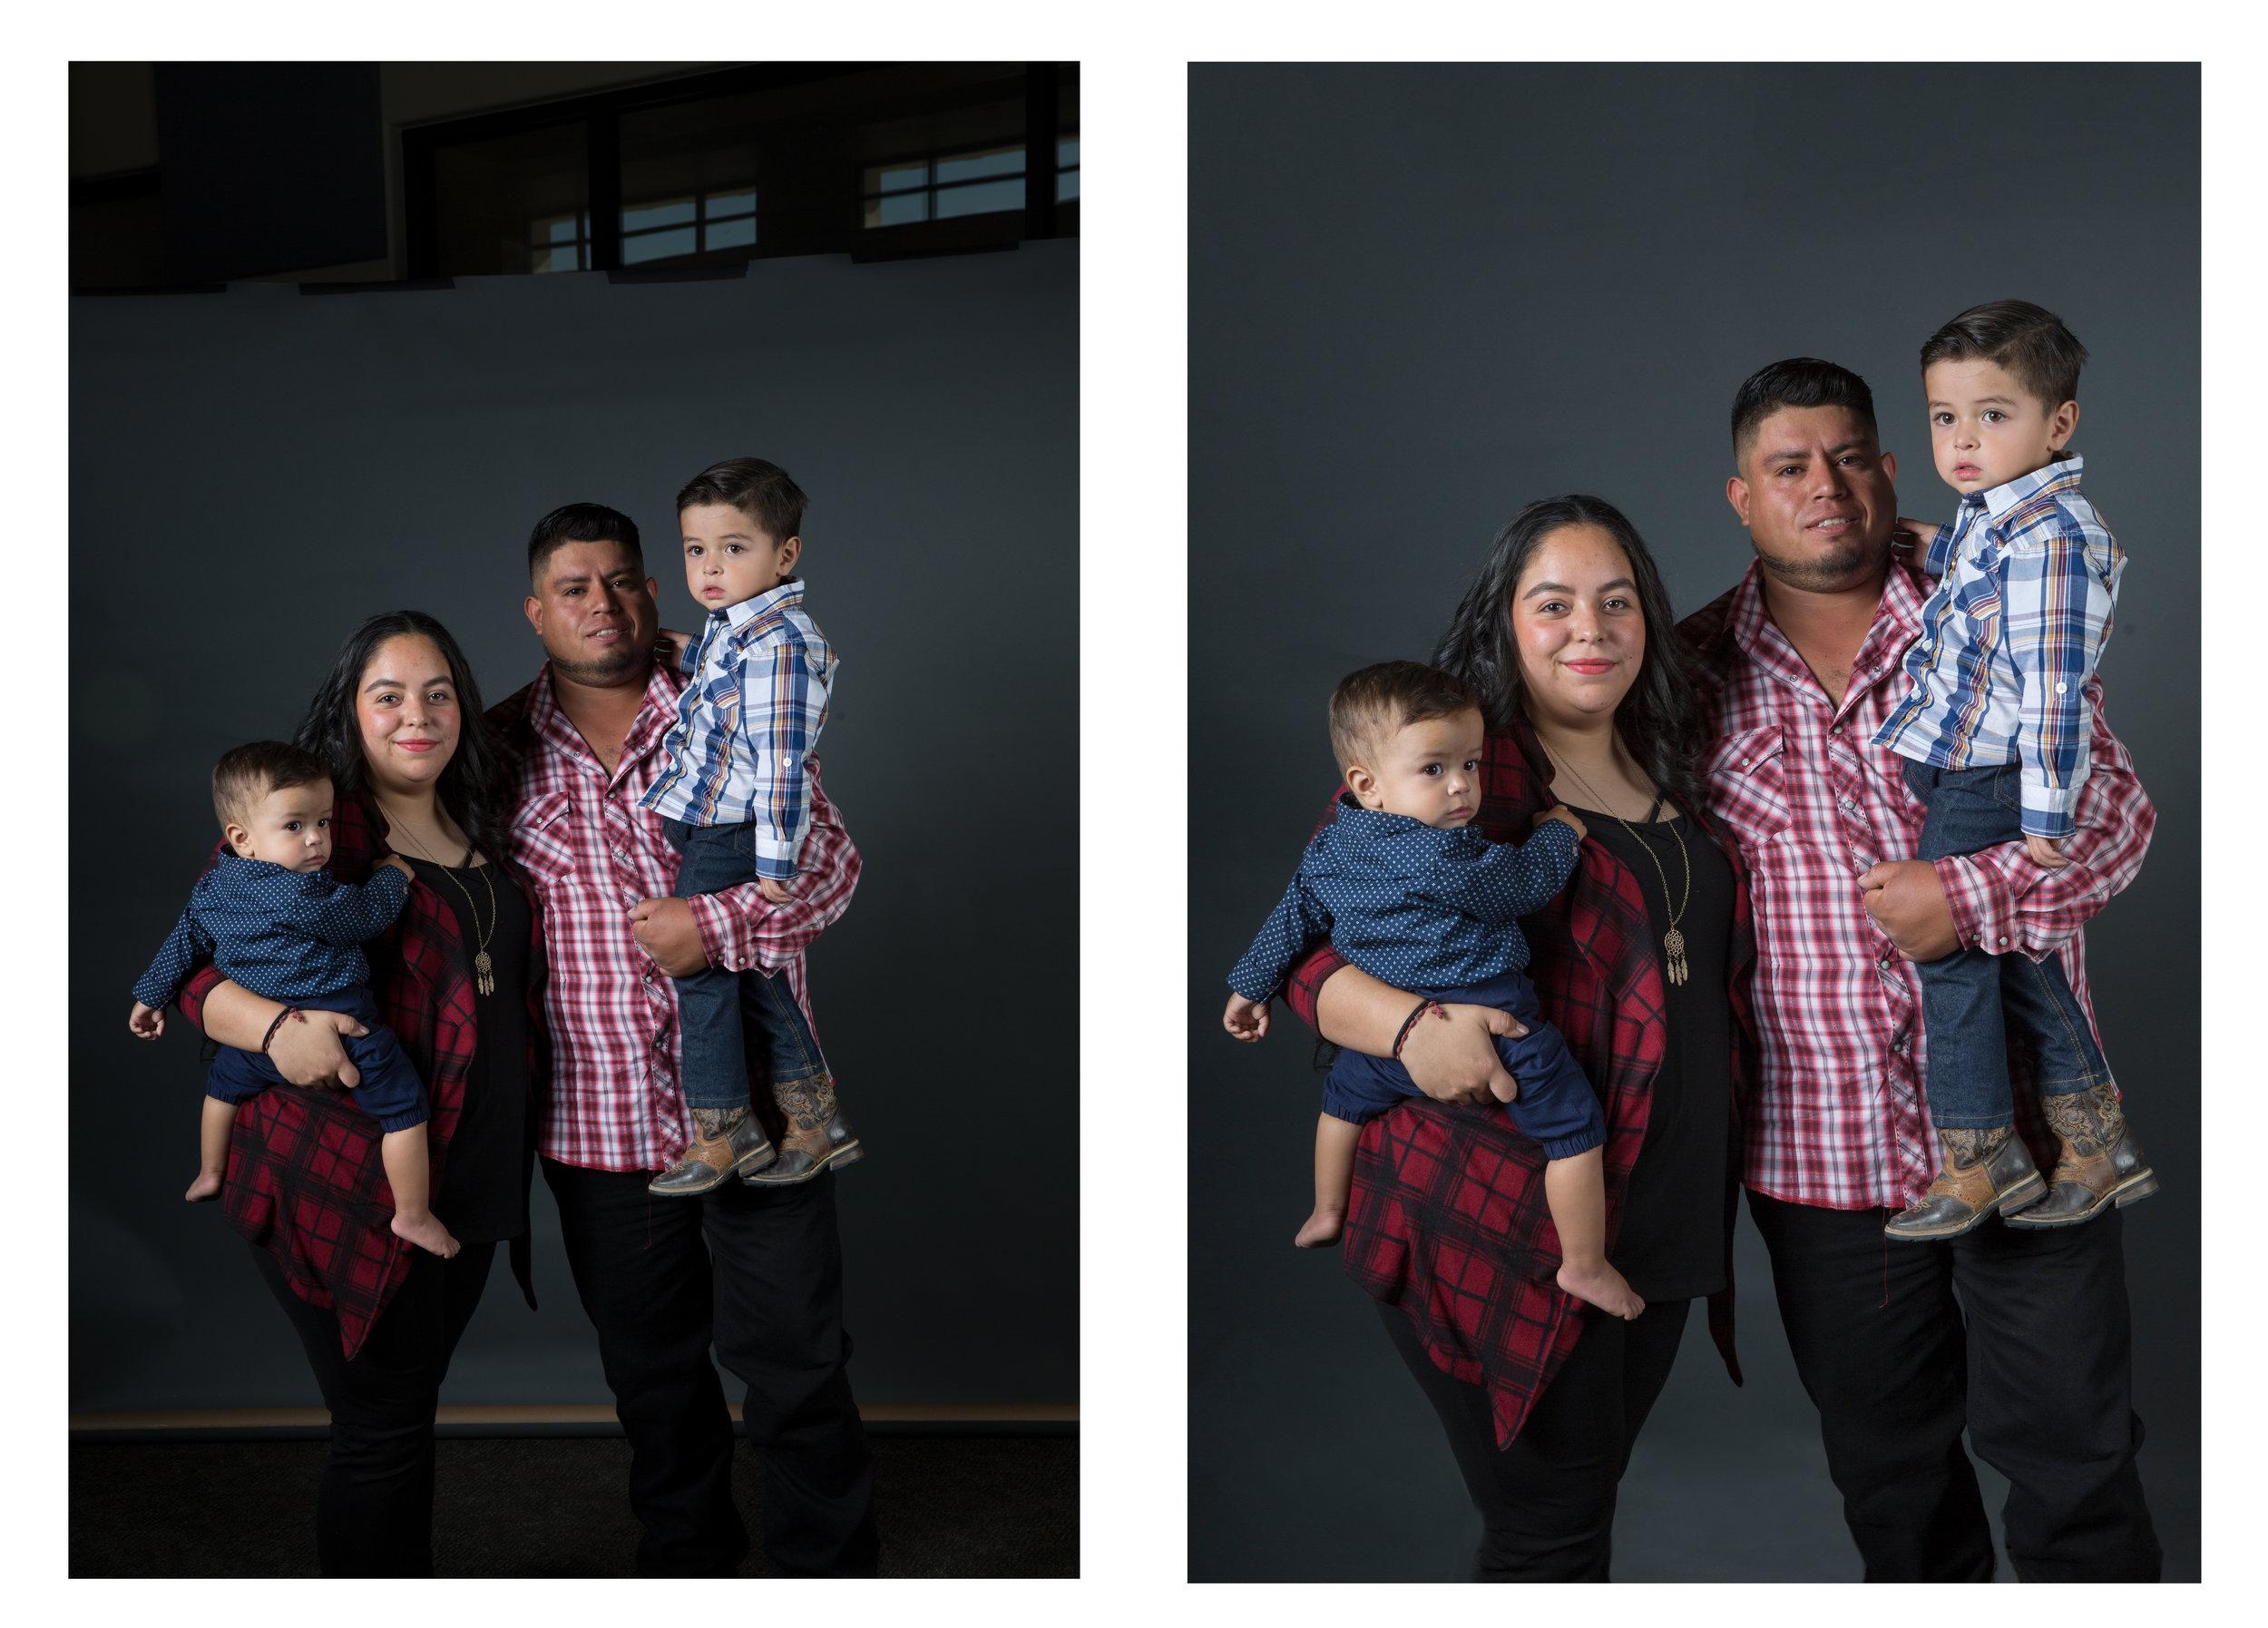 help portrait2 small.jpg